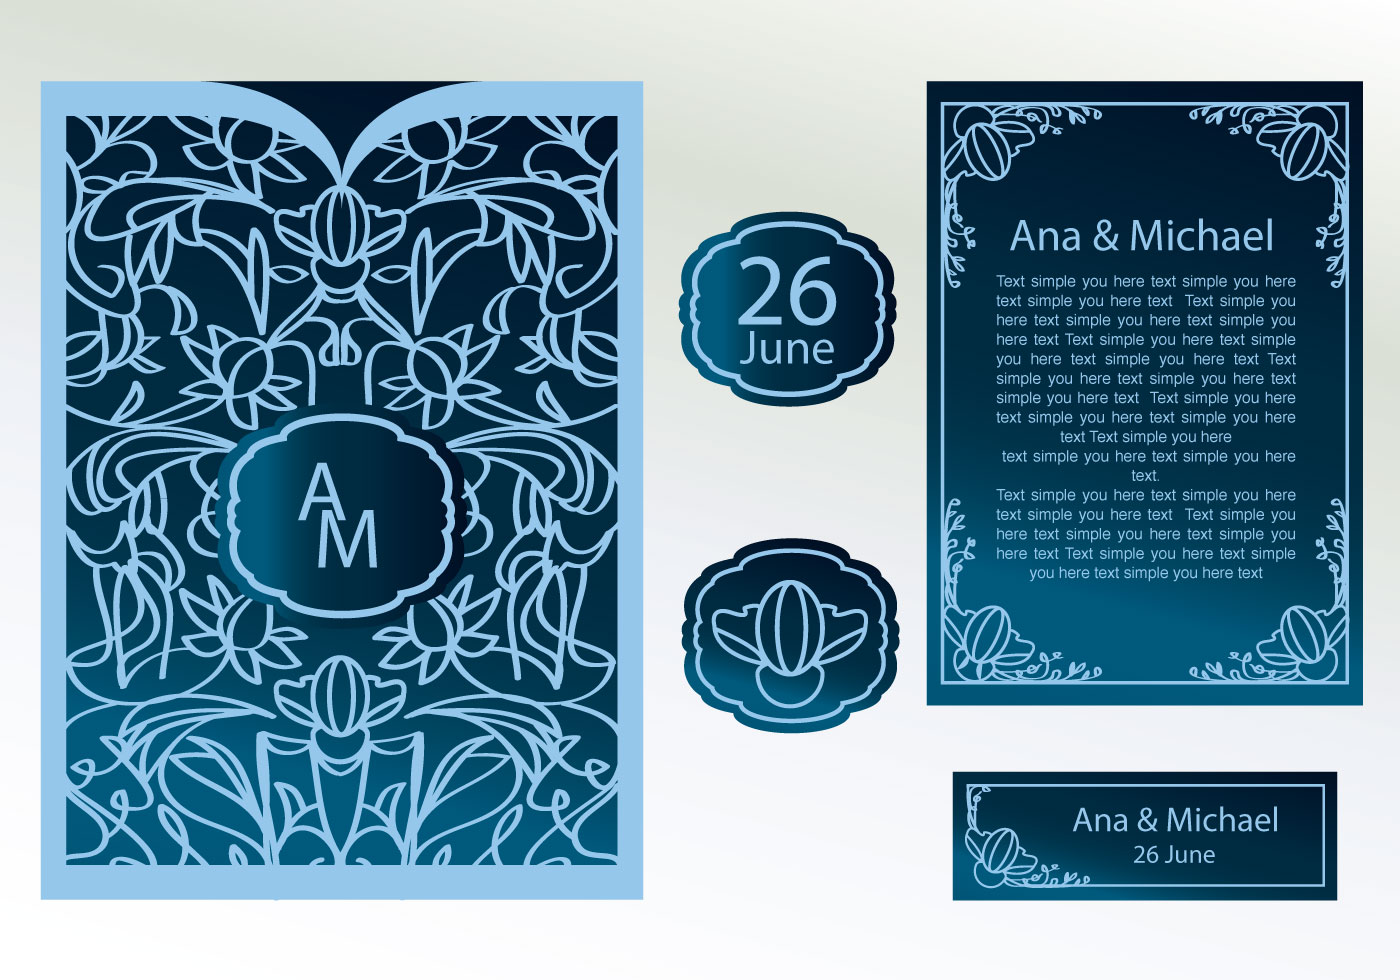 Digital Wedding Invitations Templates as perfect invitation ideas